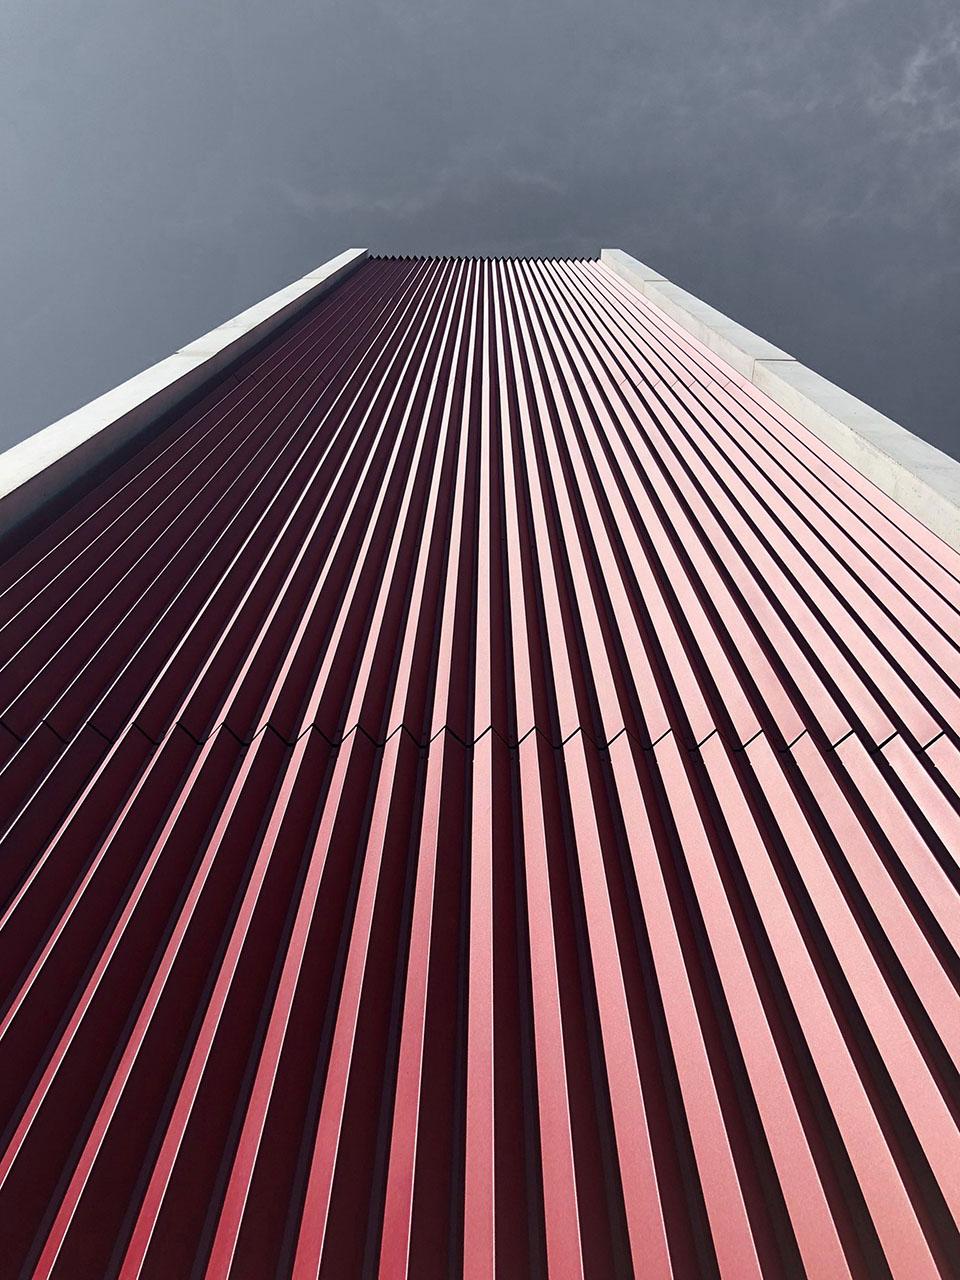 Feuerwehrhaus Kaufbeuren, Turm Fassade